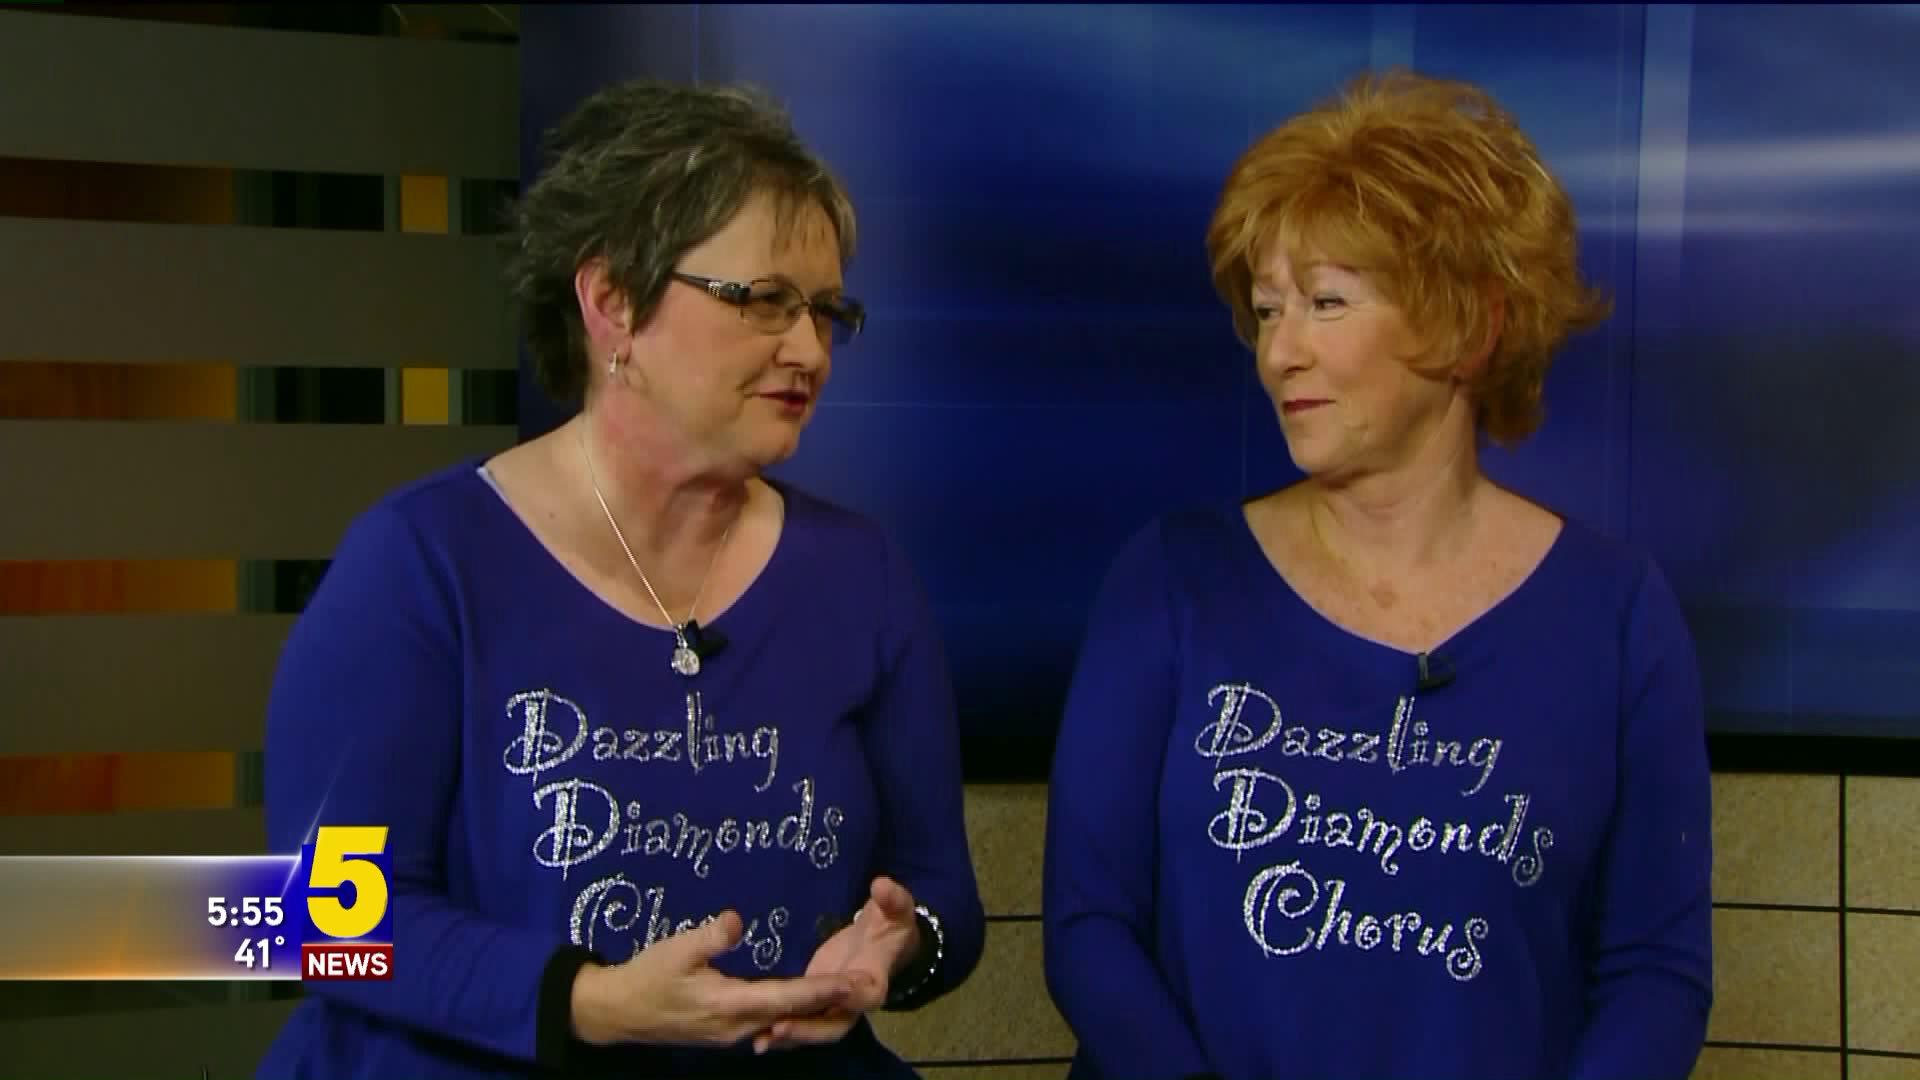 dazzling-diamonds-chorus